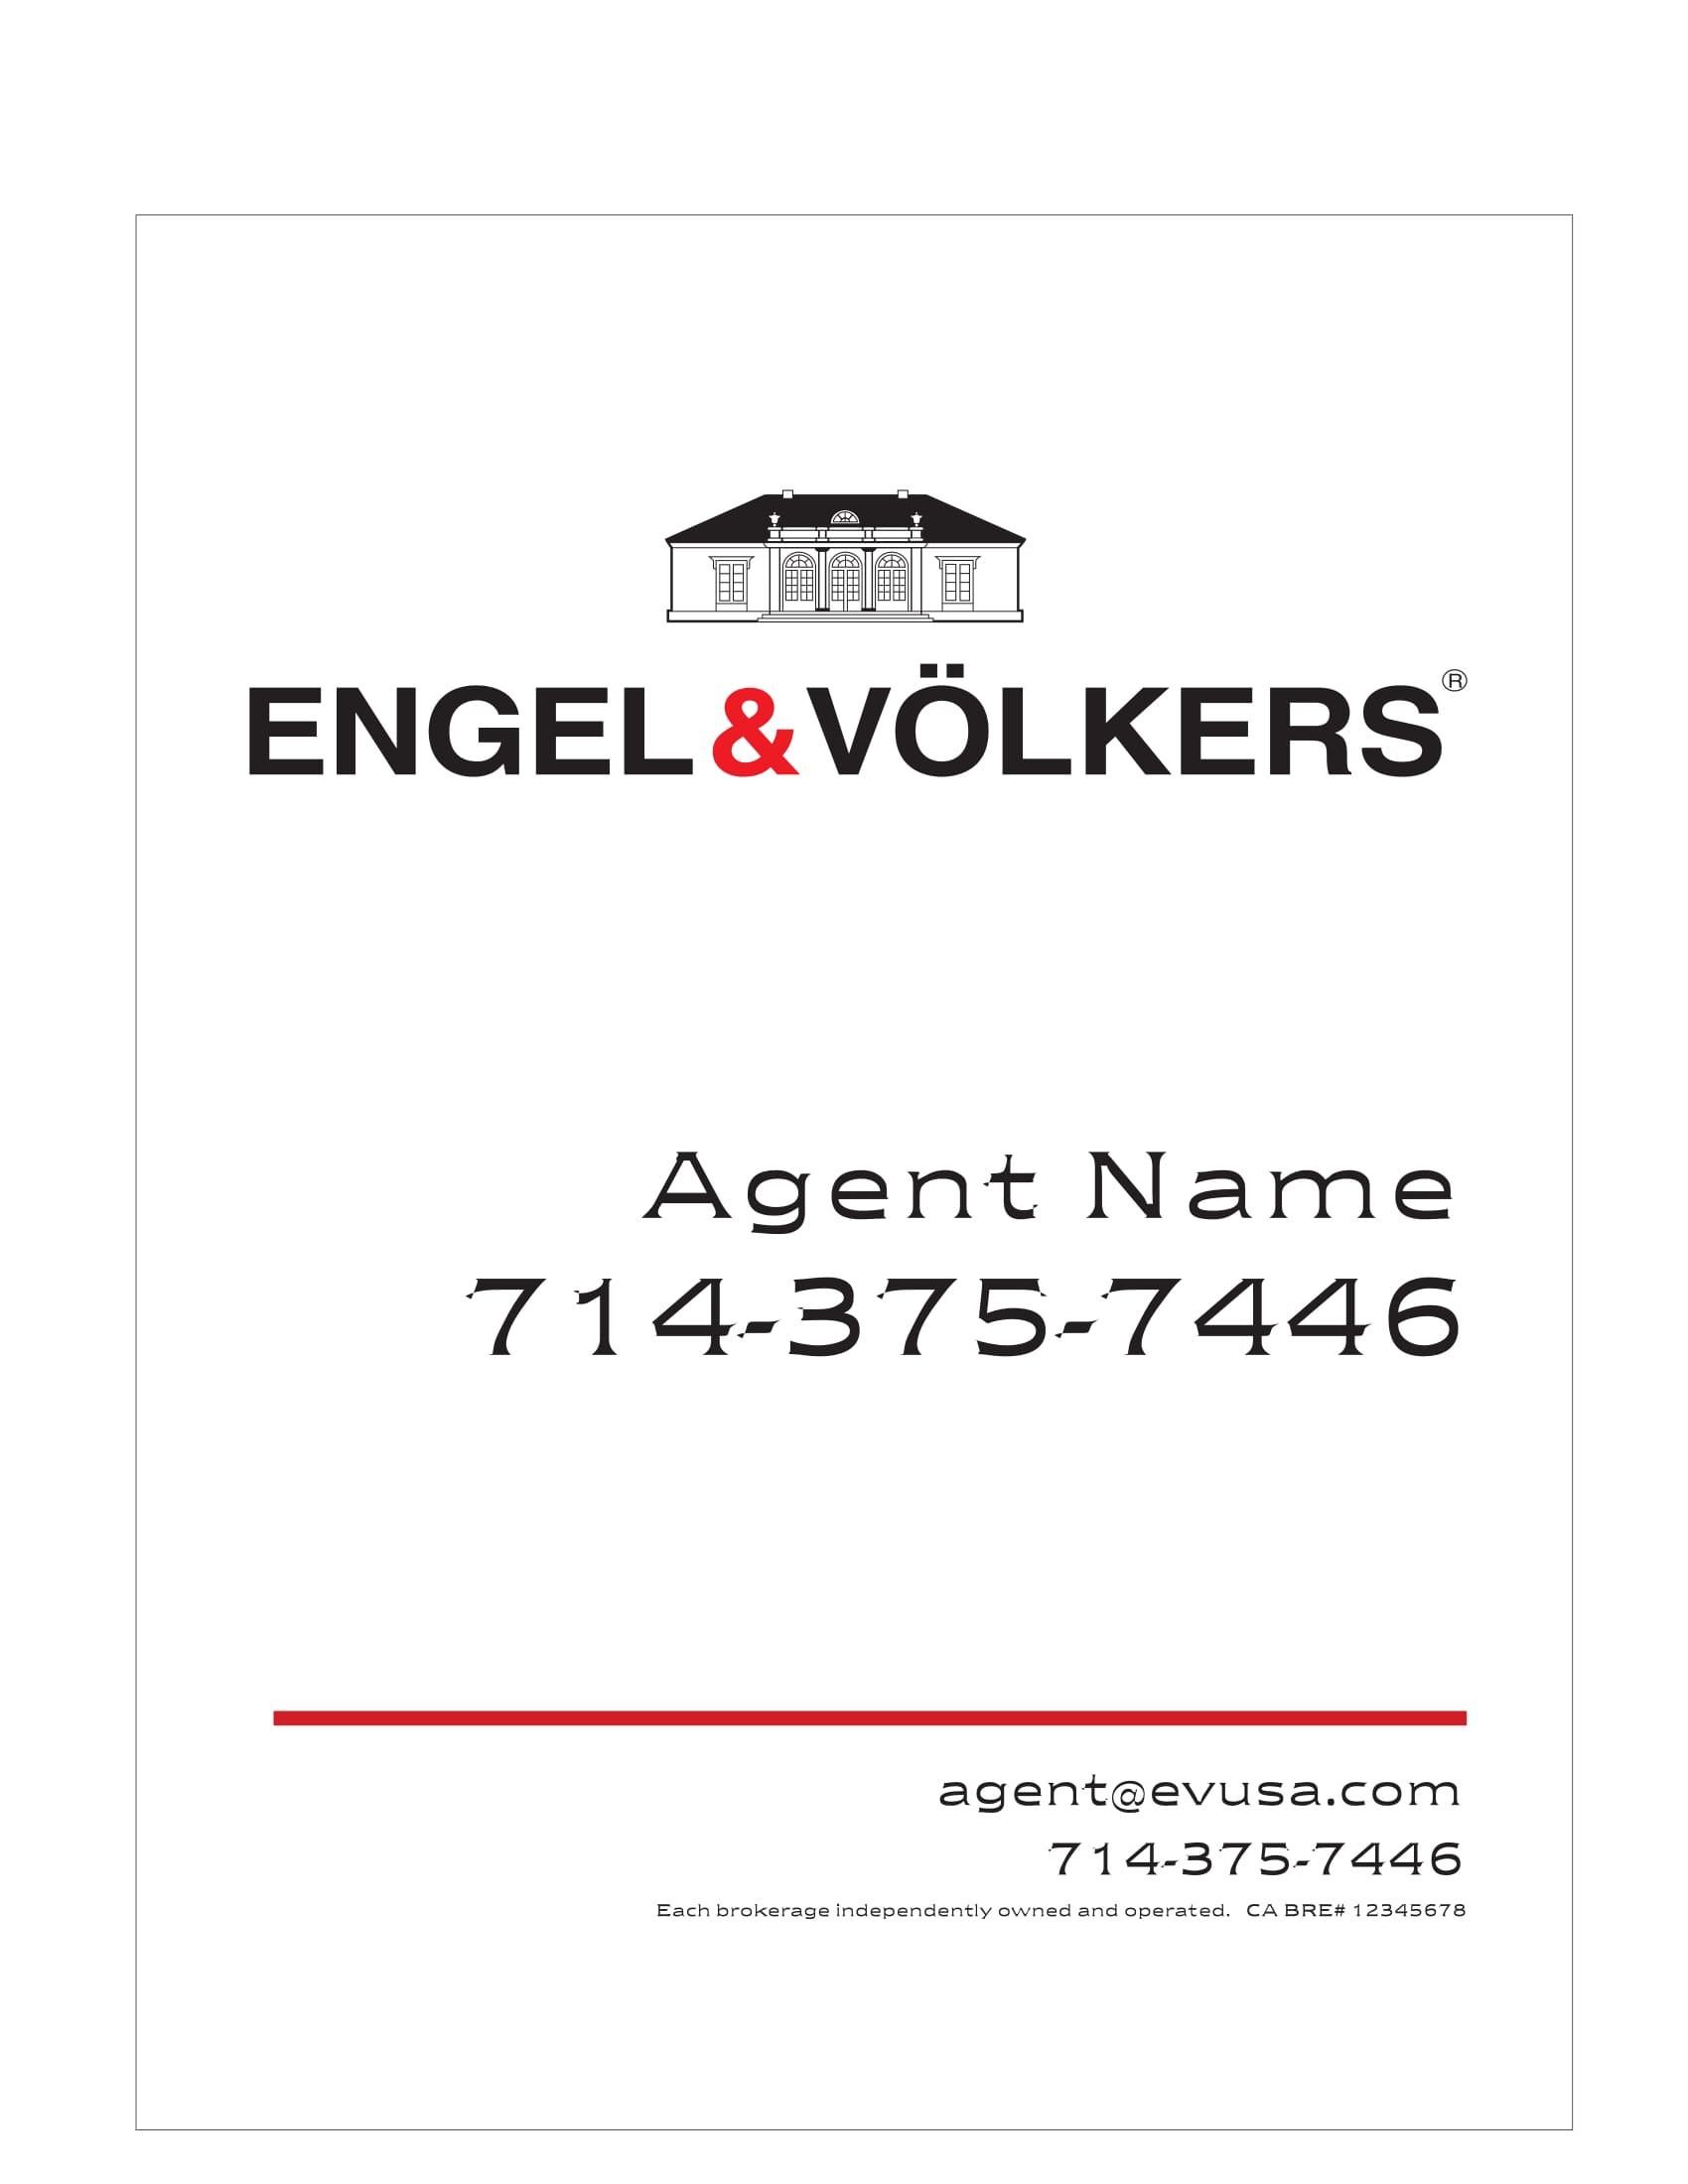 Engel & Volkers For Sale Signs